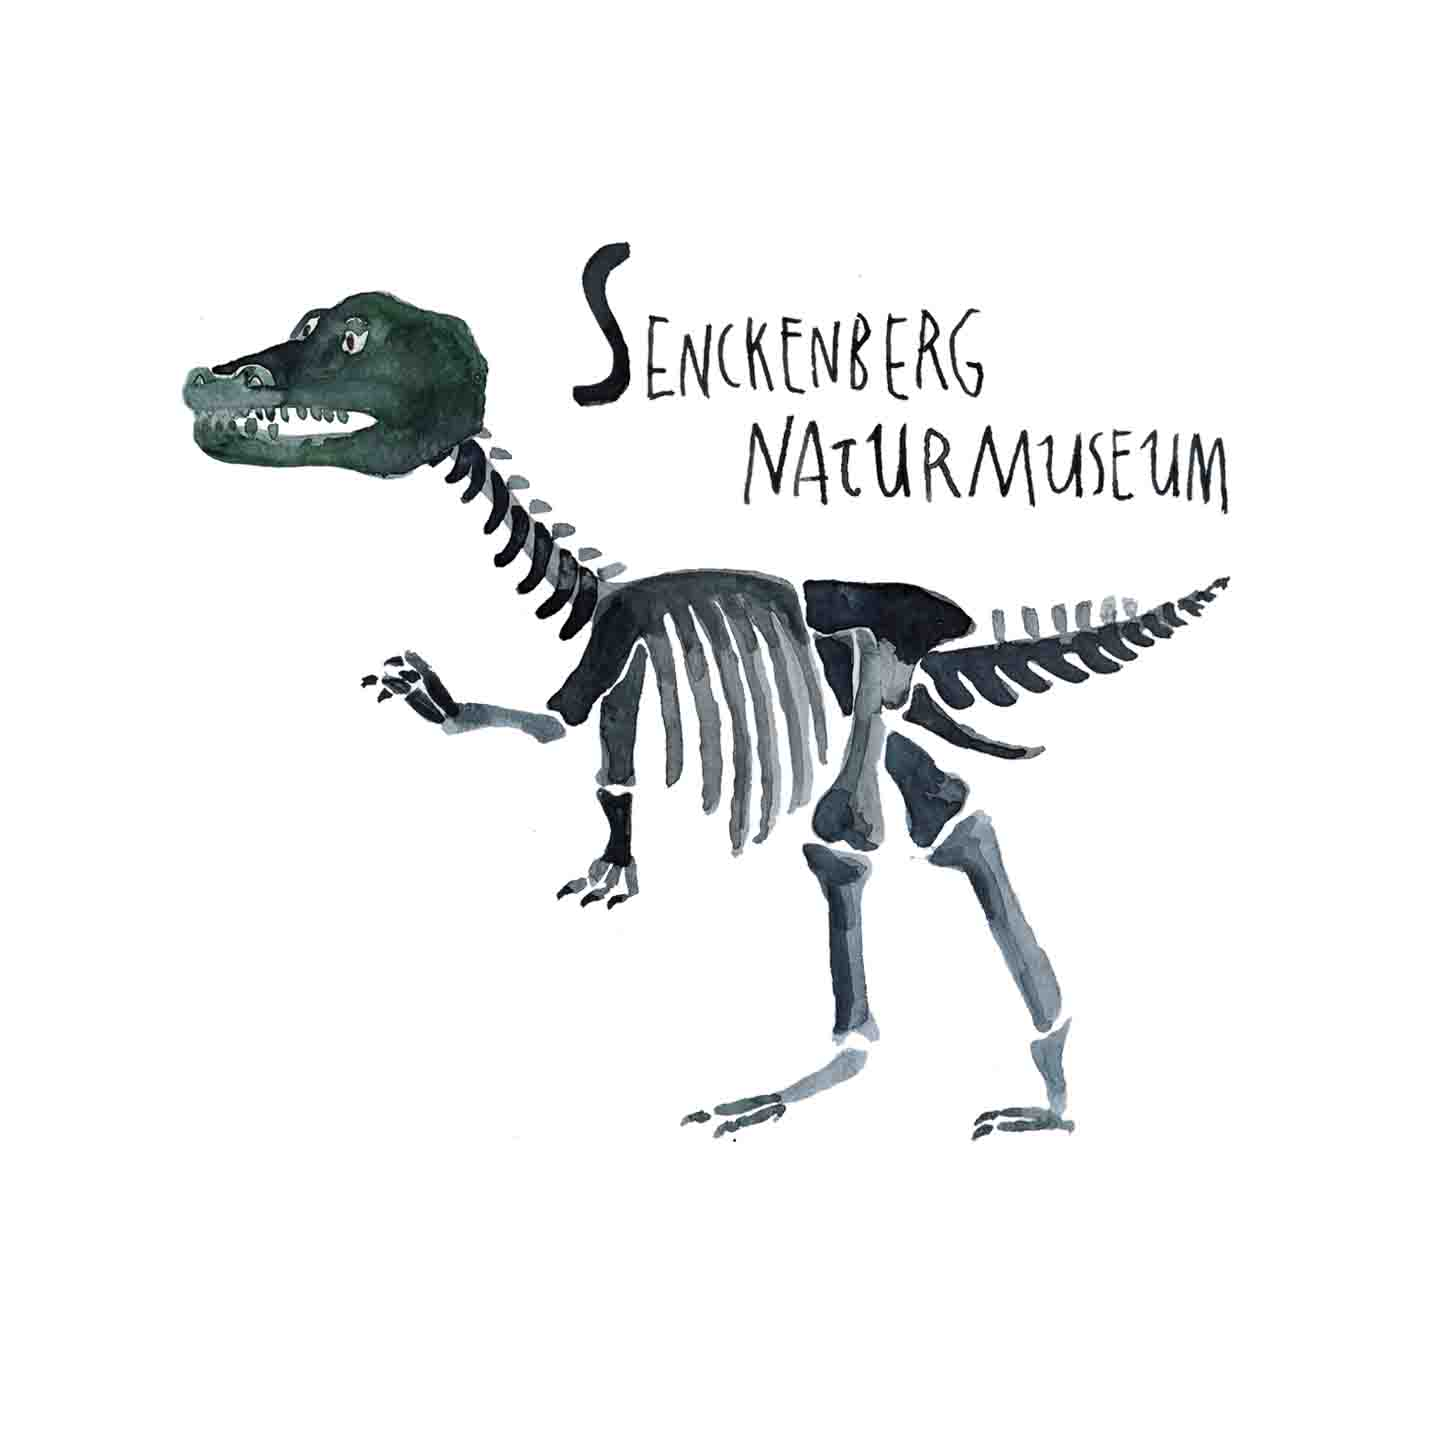 S Senckenberg Naturmuseum